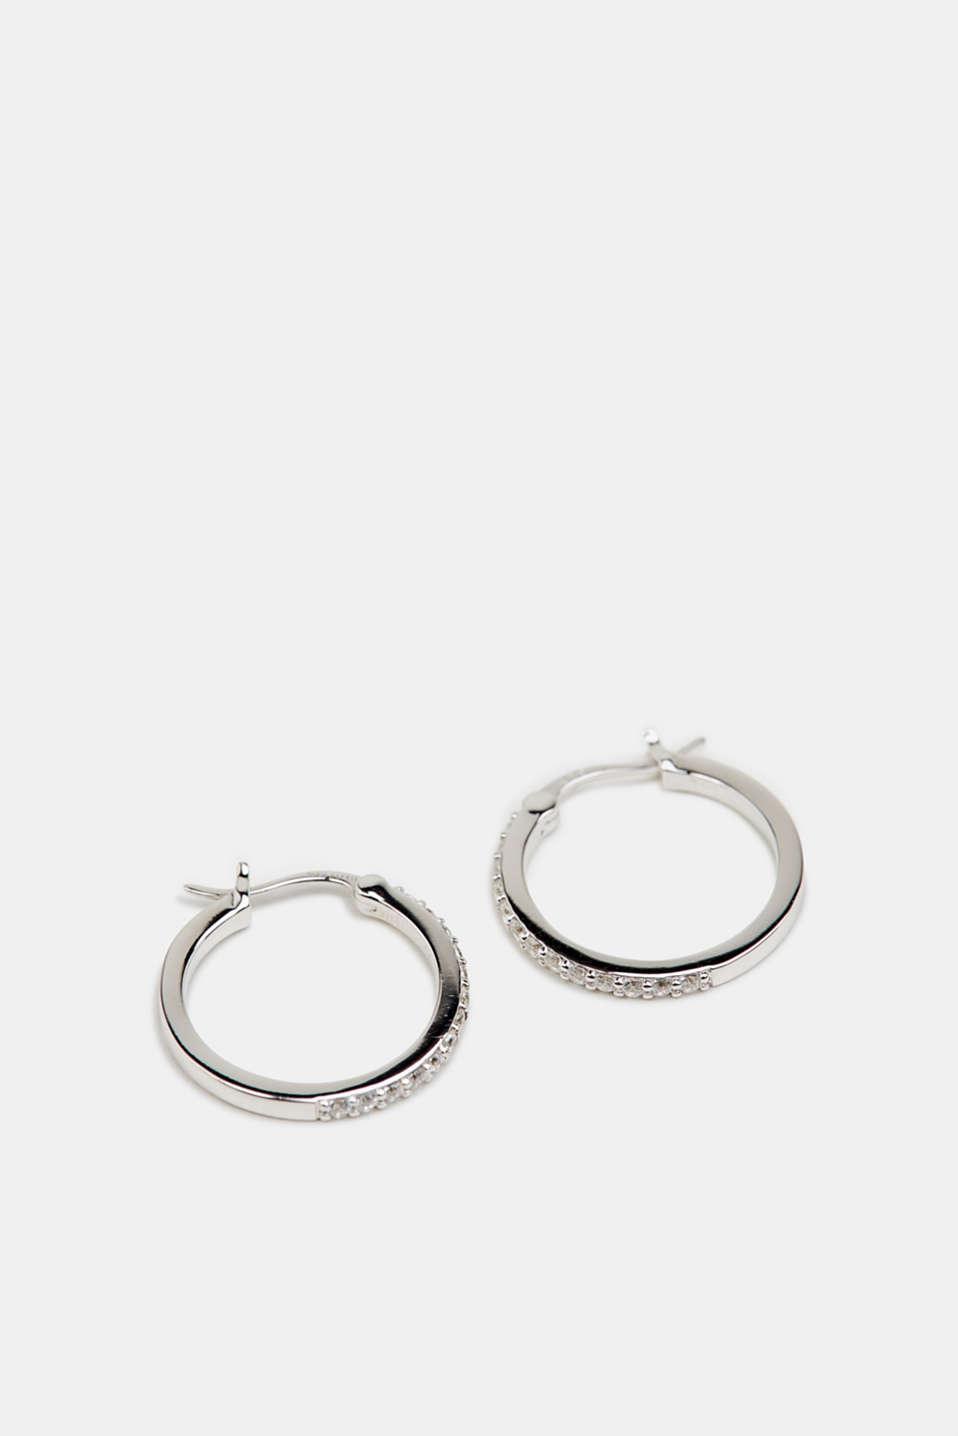 Hoop earrings set with zirconia, sterling silver, LCSILVER, detail image number 0